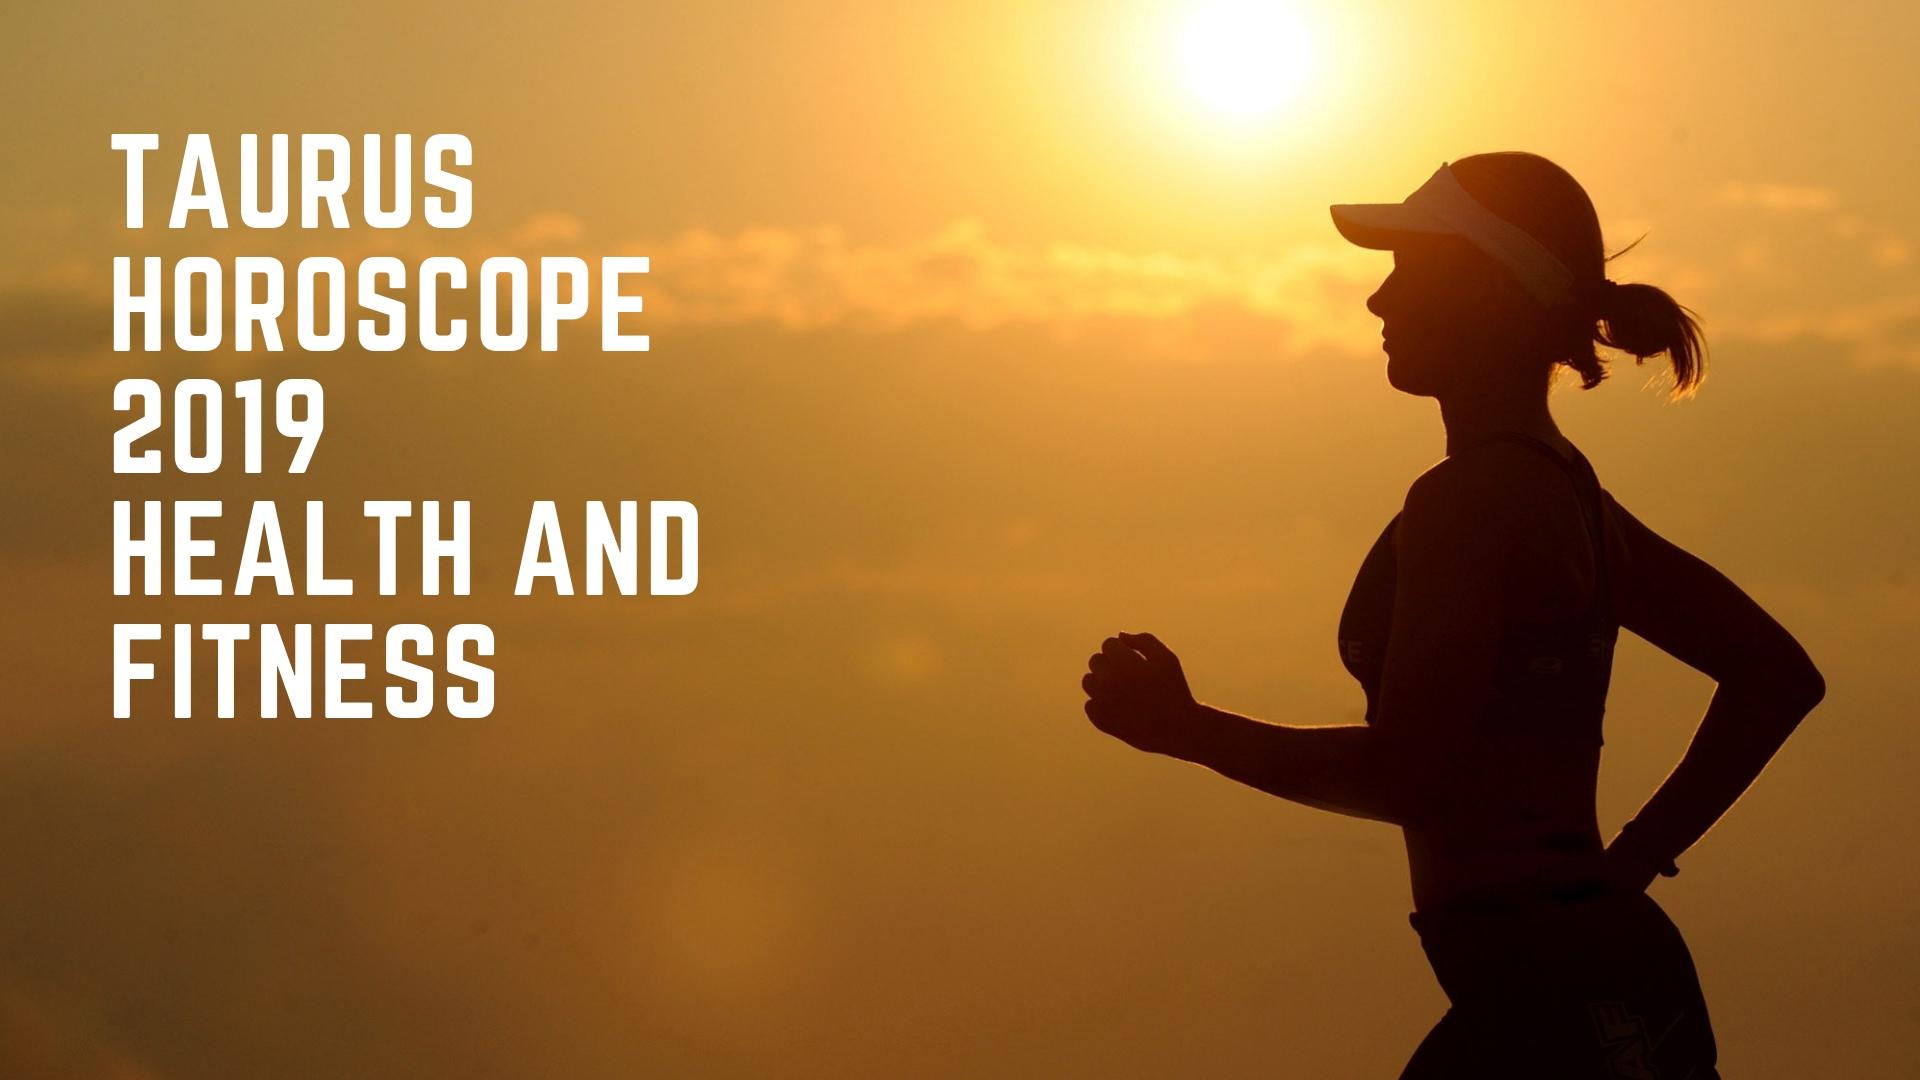 Taurus Horoscope 2019 on Health and Fitness -